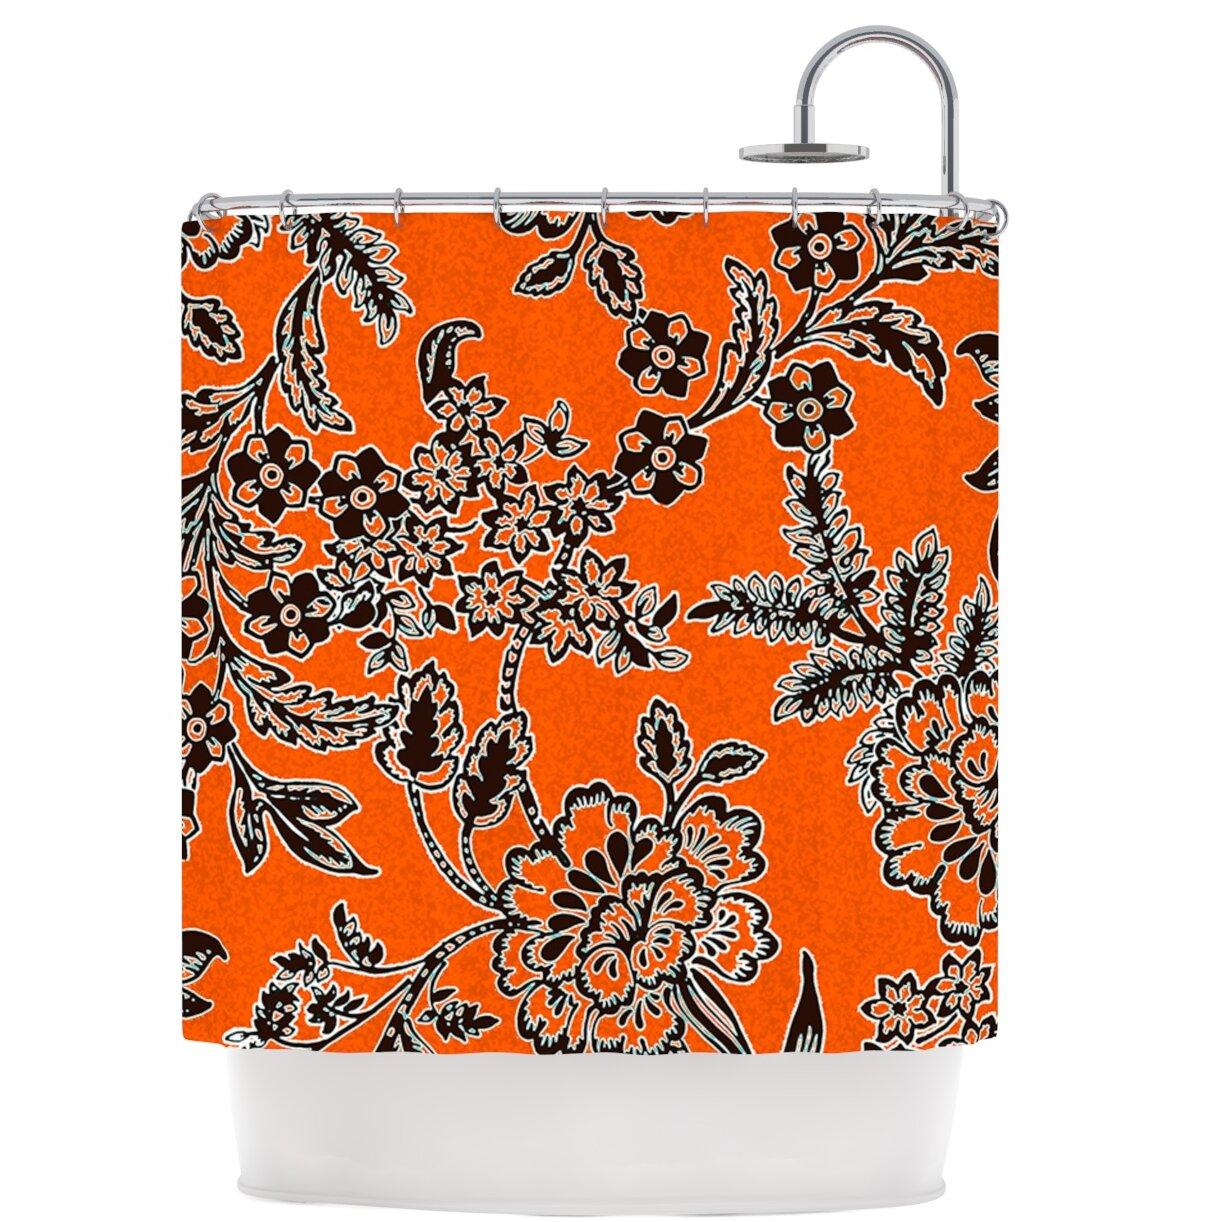 Kess Inhouse Shower Curtain Allmodern